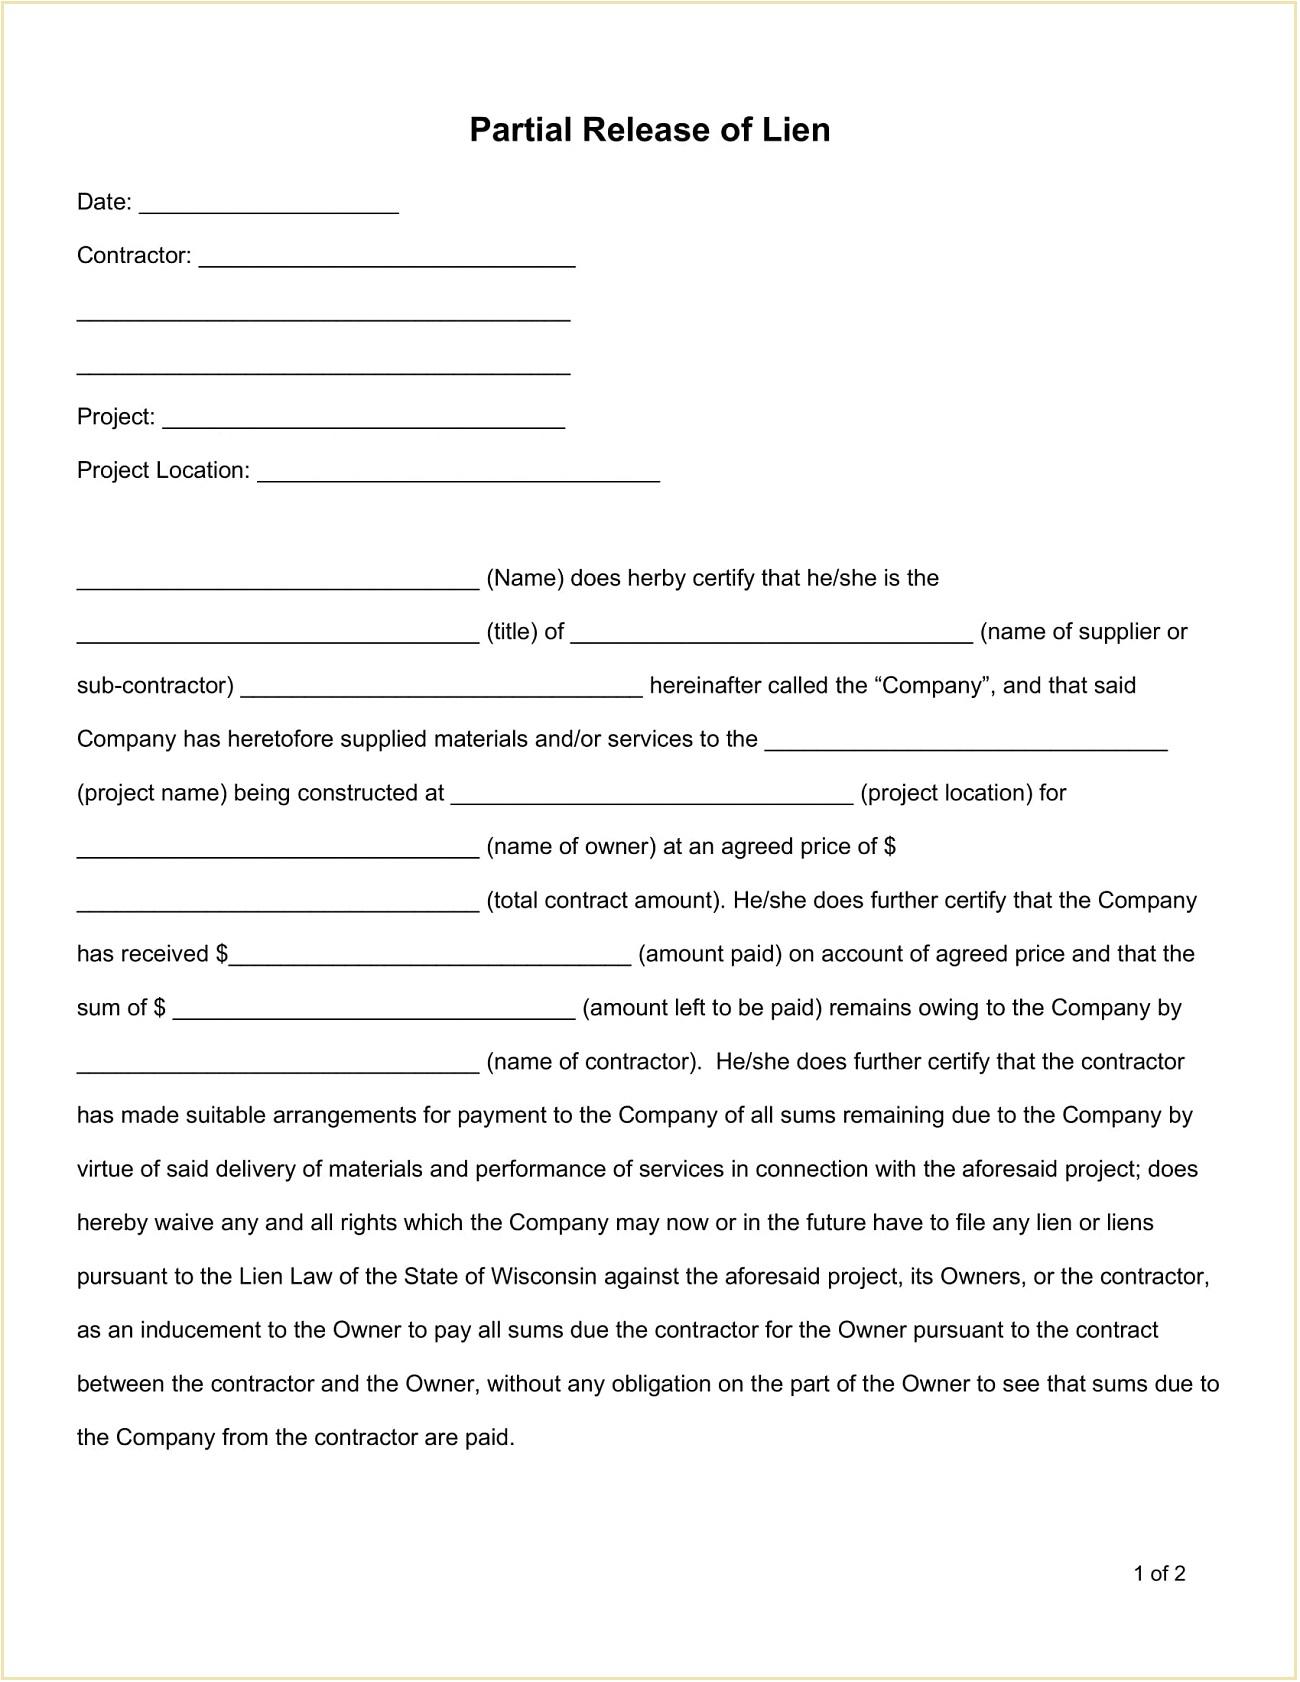 Partial Release Lien Form Template Word Doc